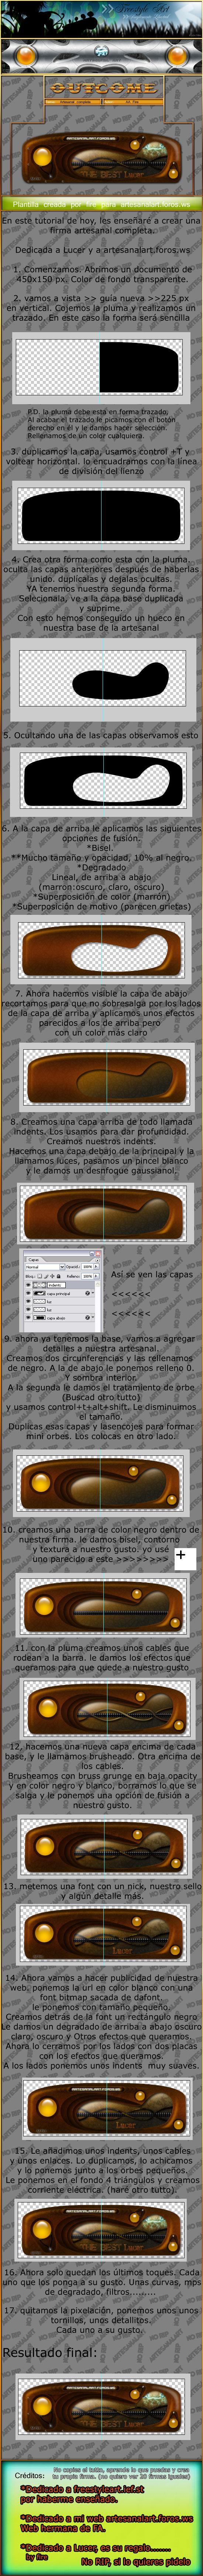 Artesanal completa tutorial Tutorial_artesanal_simple_by_fire_artesanalart